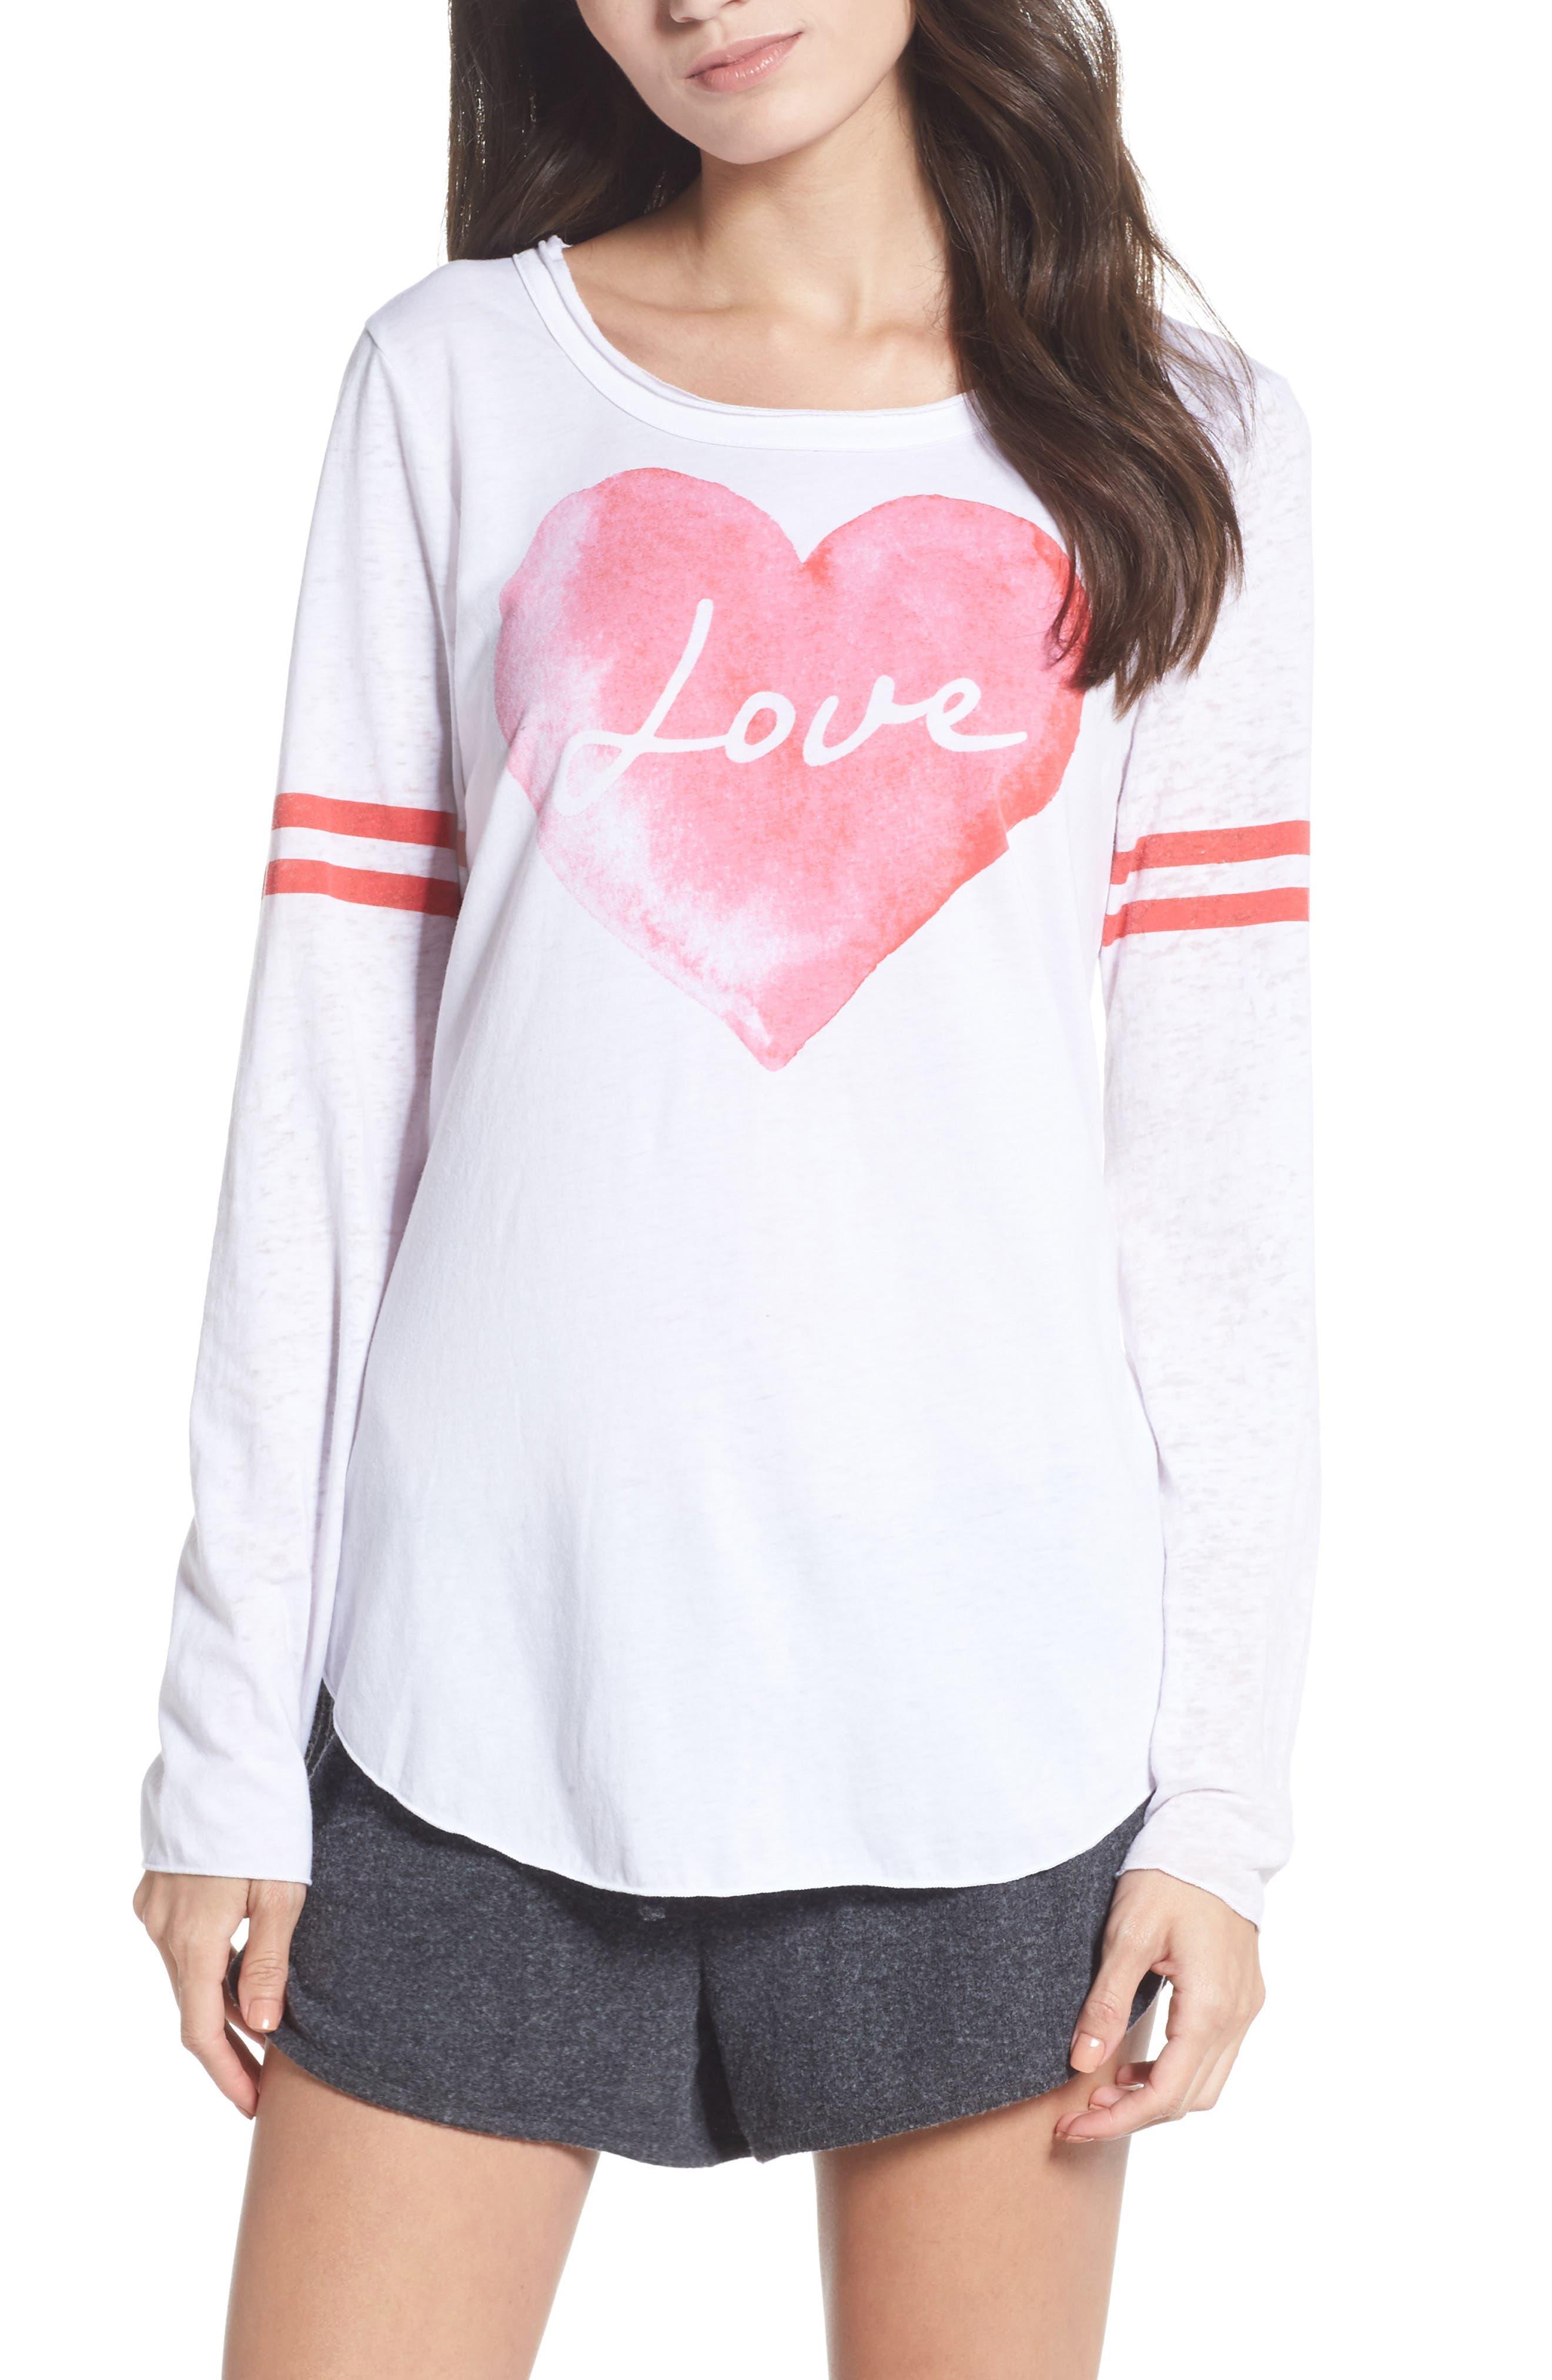 Lover Heart Tee,                             Main thumbnail 1, color,                             100